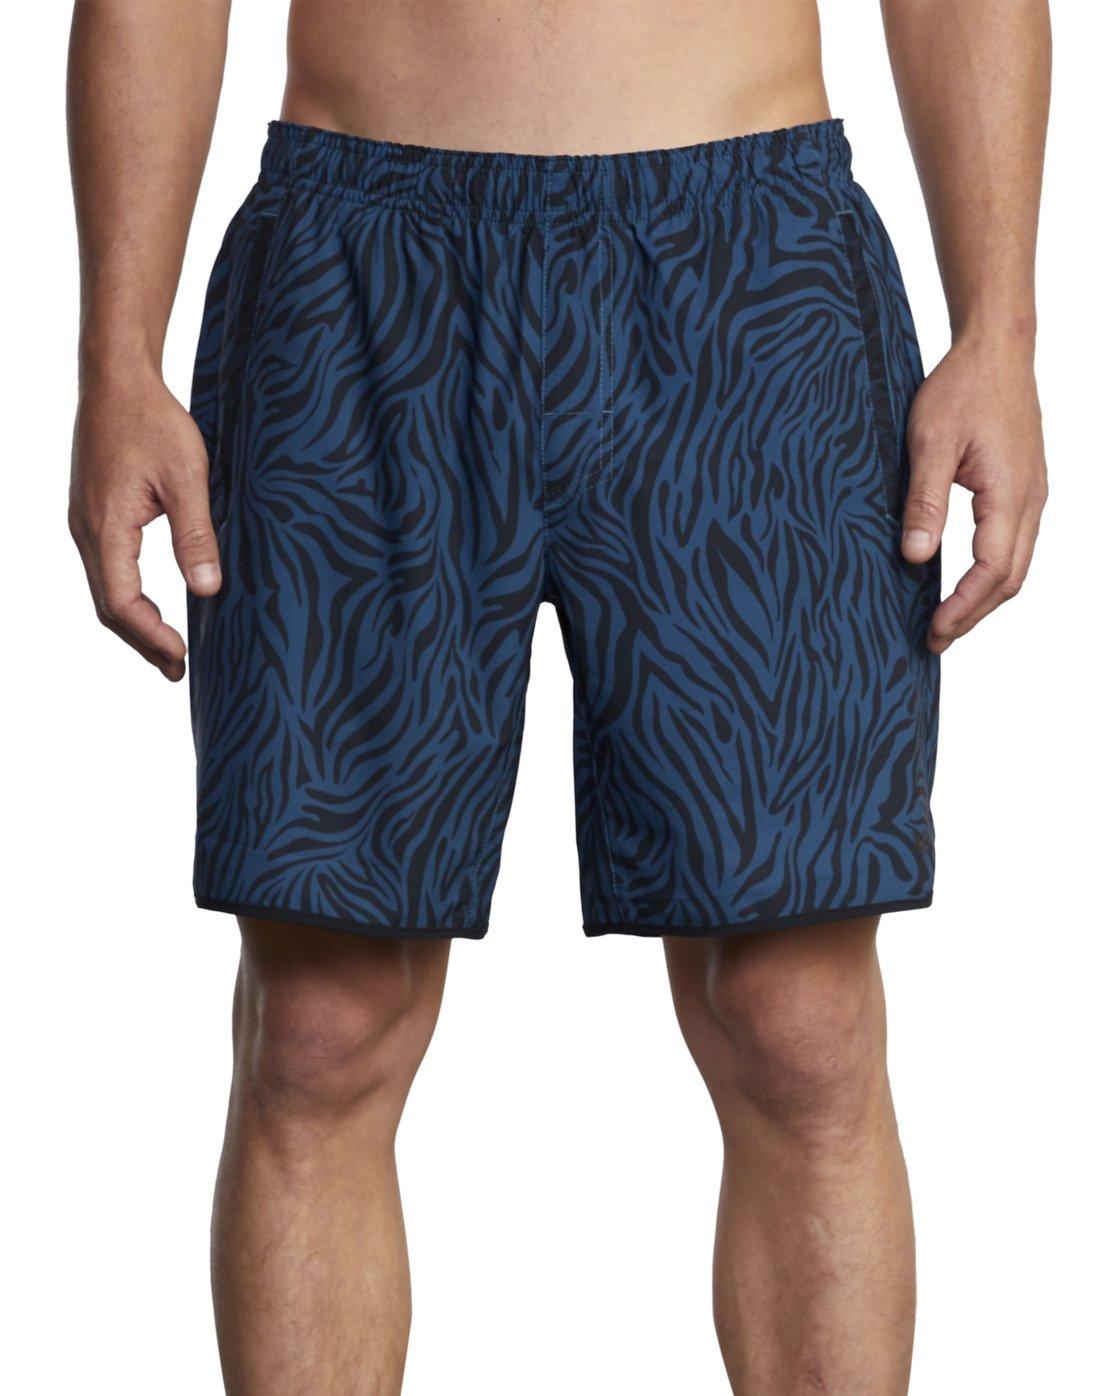 0 VA Sport Yogger Stretch - Recycled Performance Training Shorts for Men Blue X4WKMBRVS1 RVCA